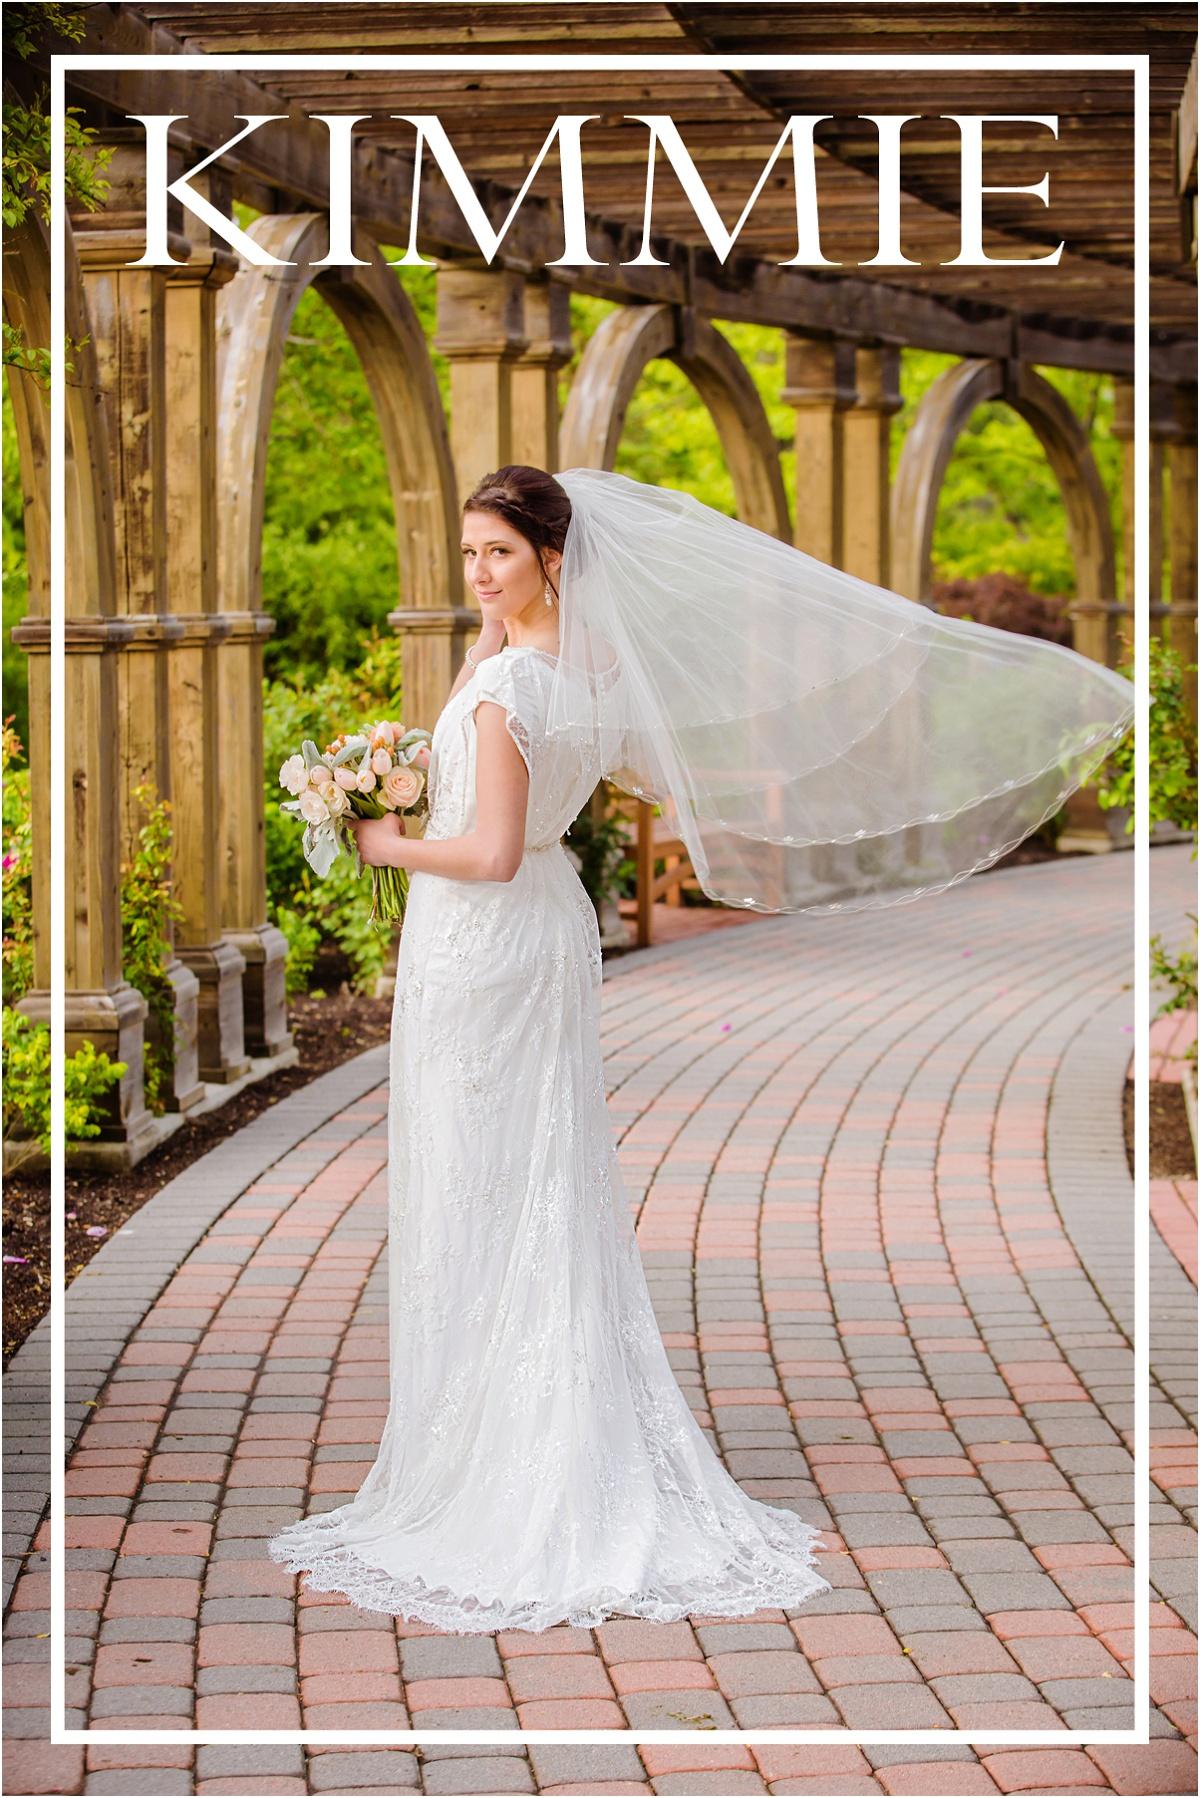 Terra Cooper Photography Weddings Brides 2015_5363.jpg